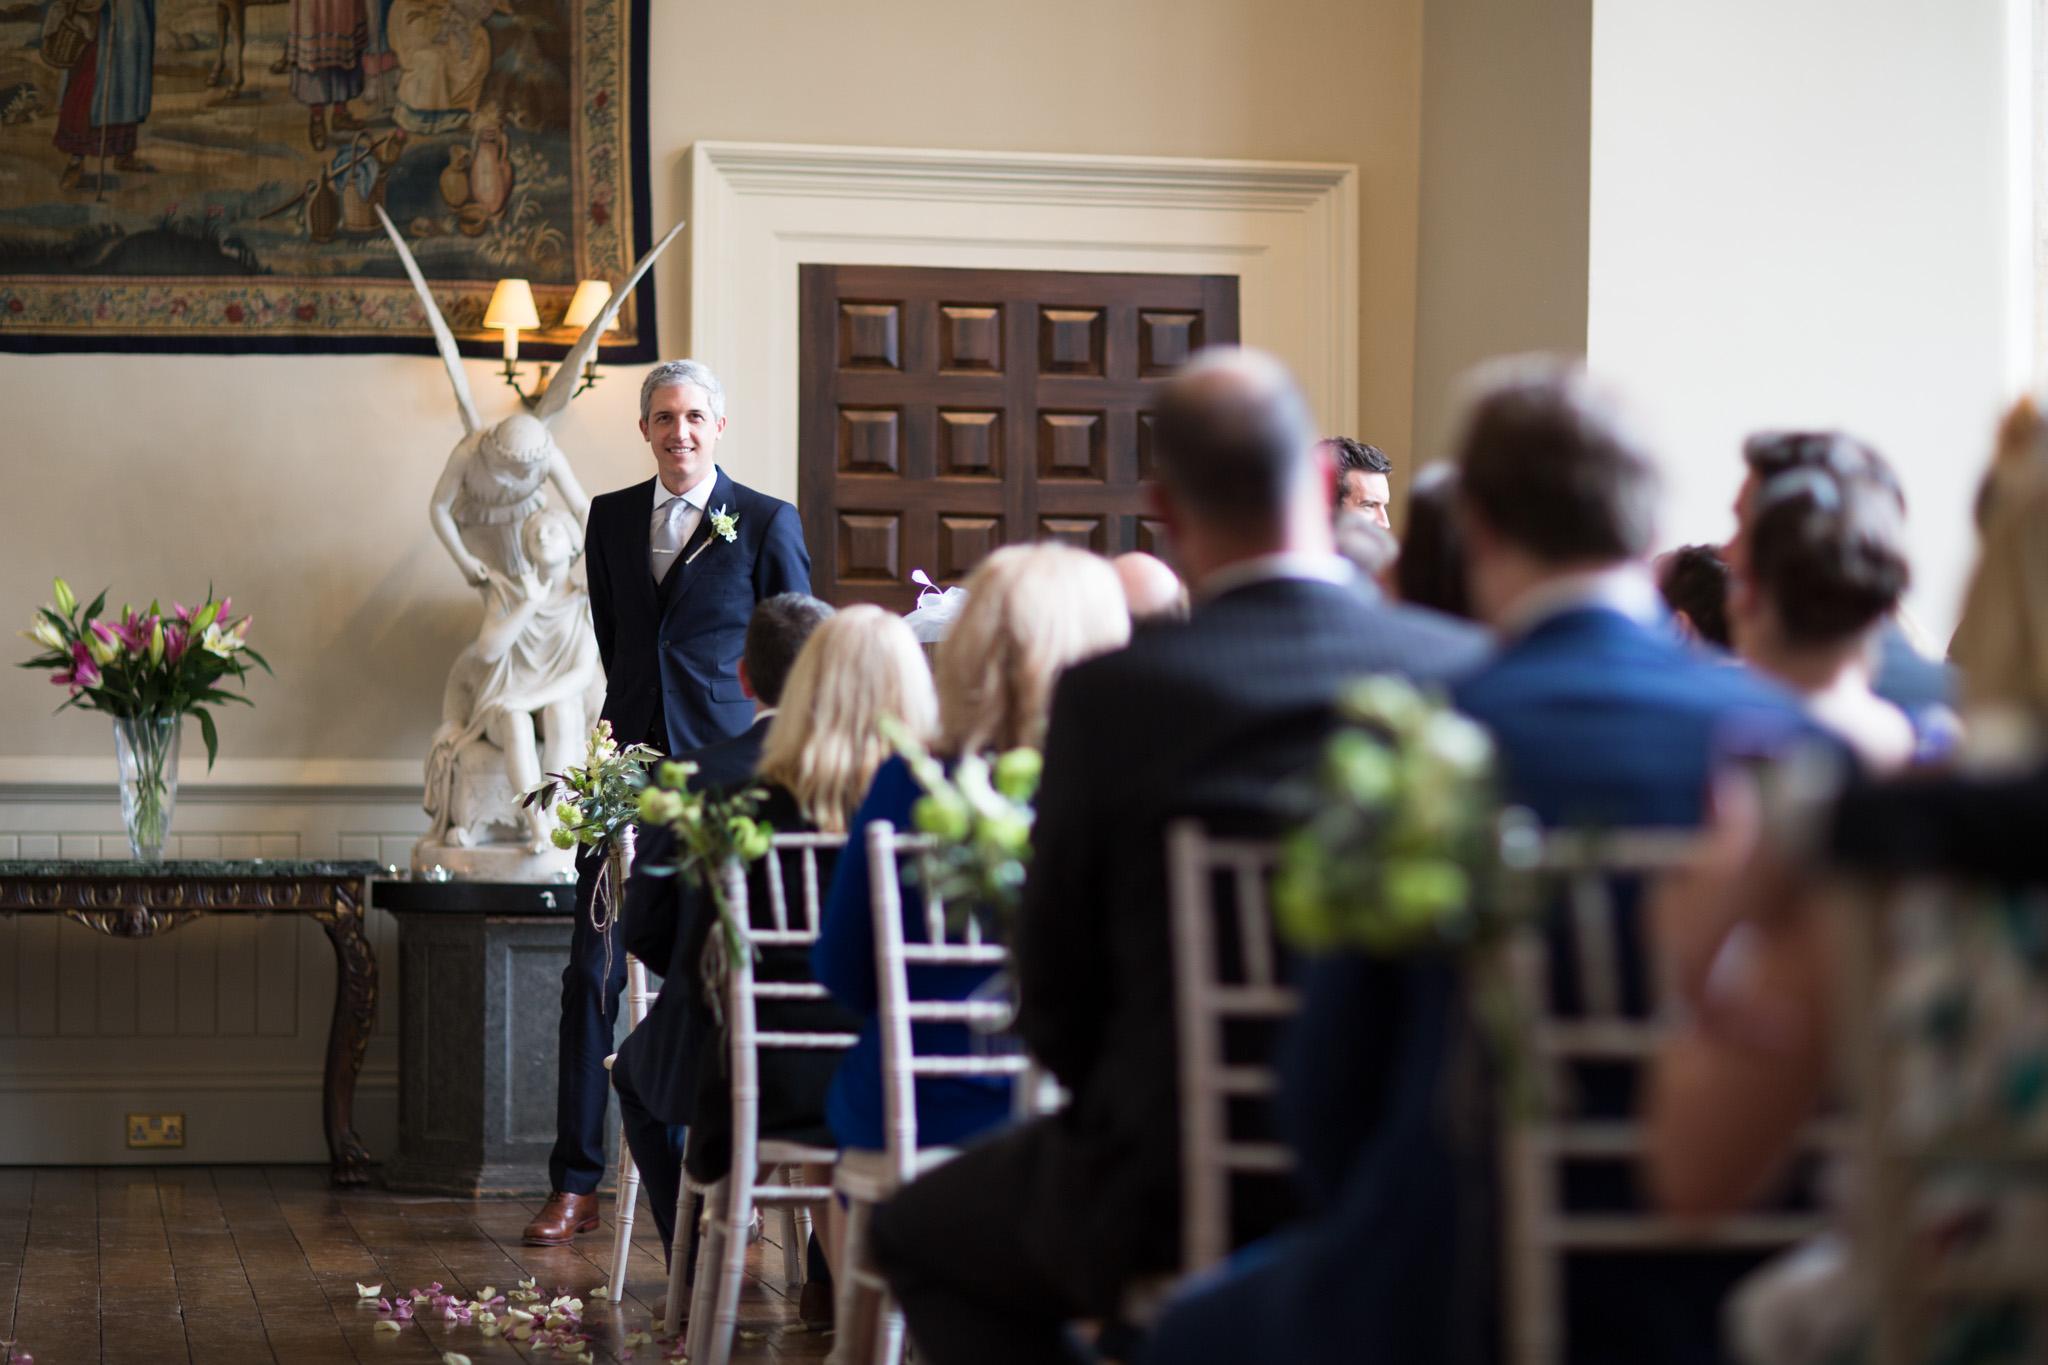 Mark_Barnes_Gloucester_Wedding_Photographer_Elmore_Court_Wedding_Photography_Mike+Kelly-30.jpg